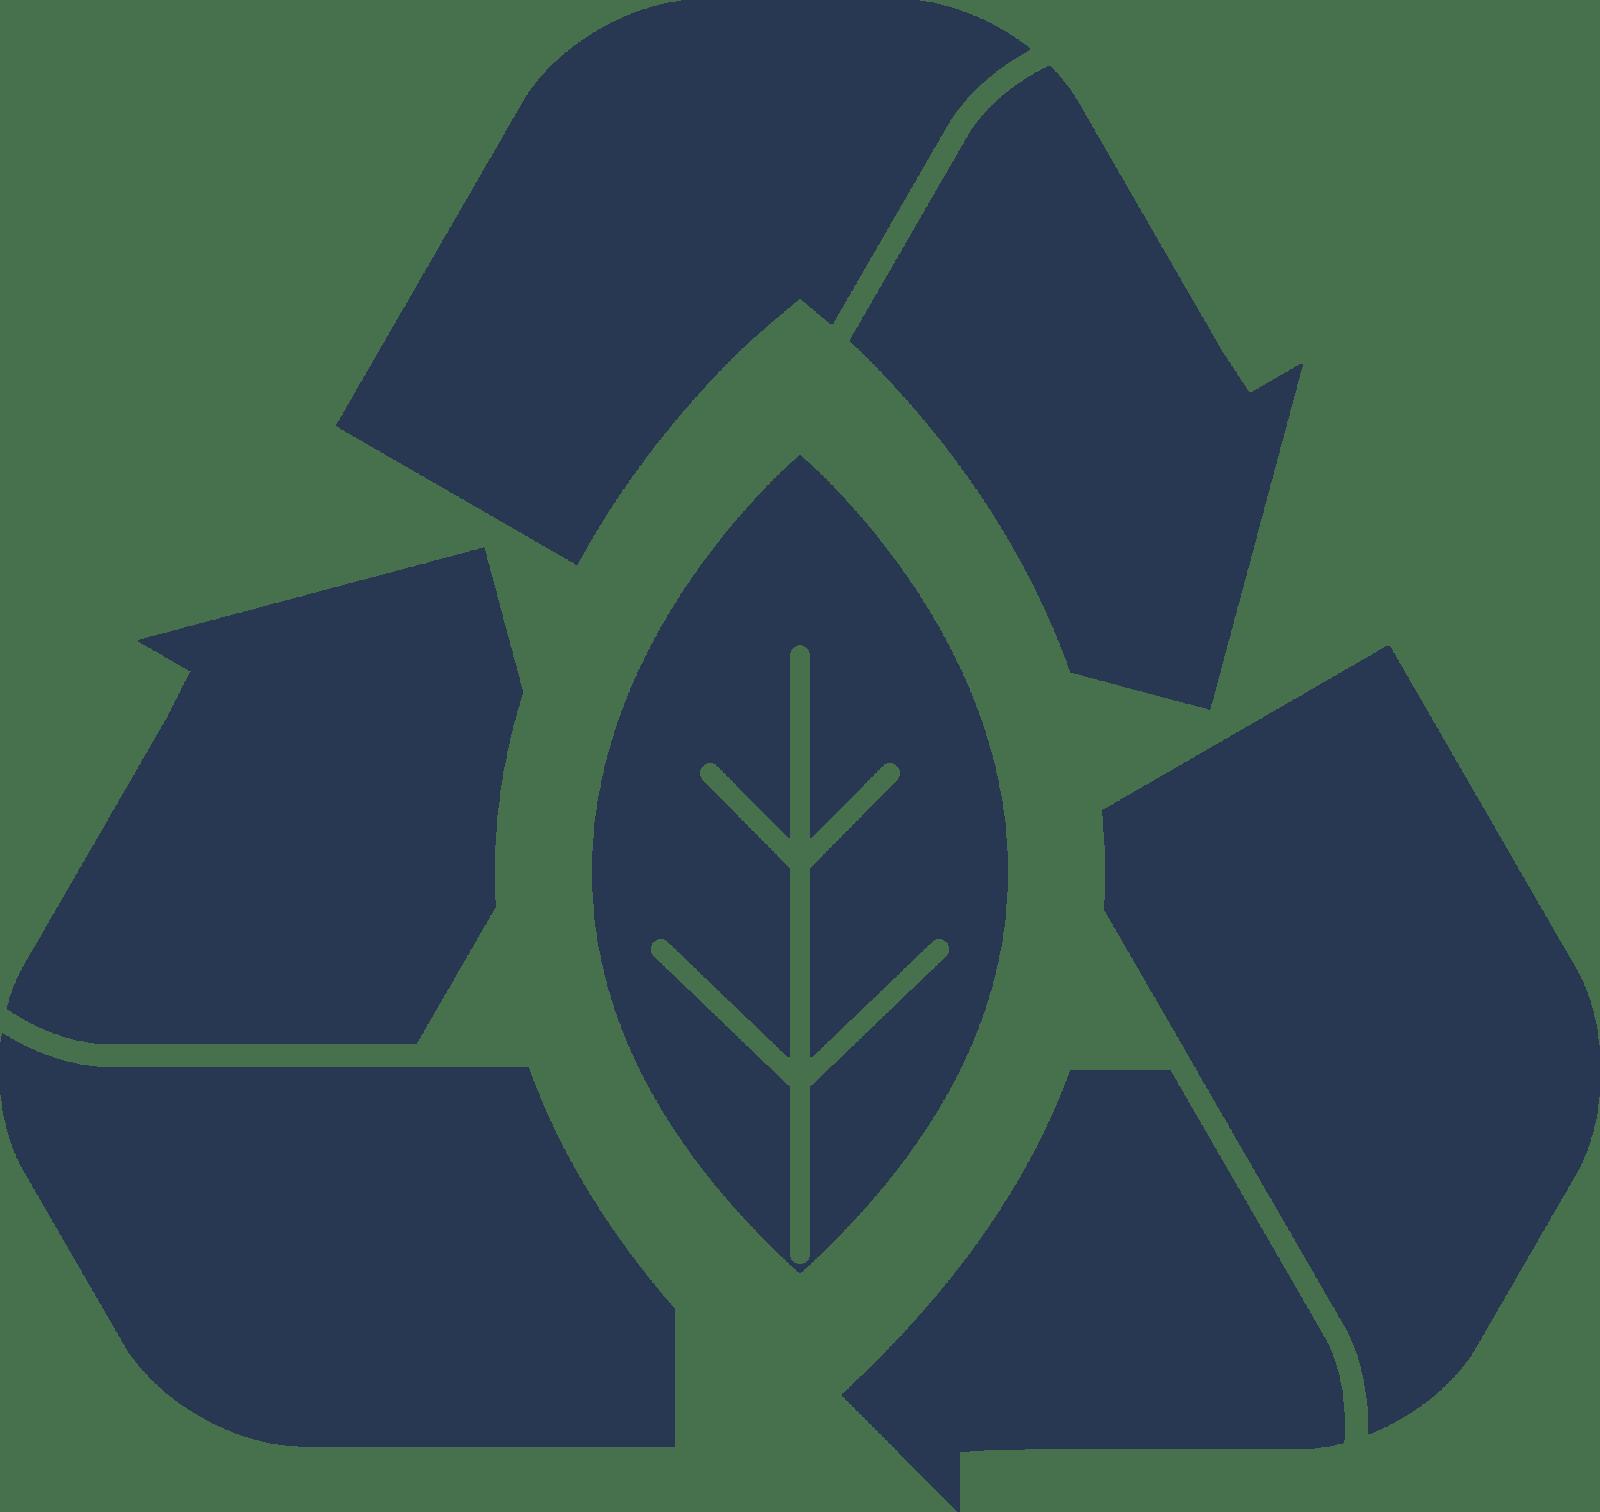 Interclass net zero carbon strategy